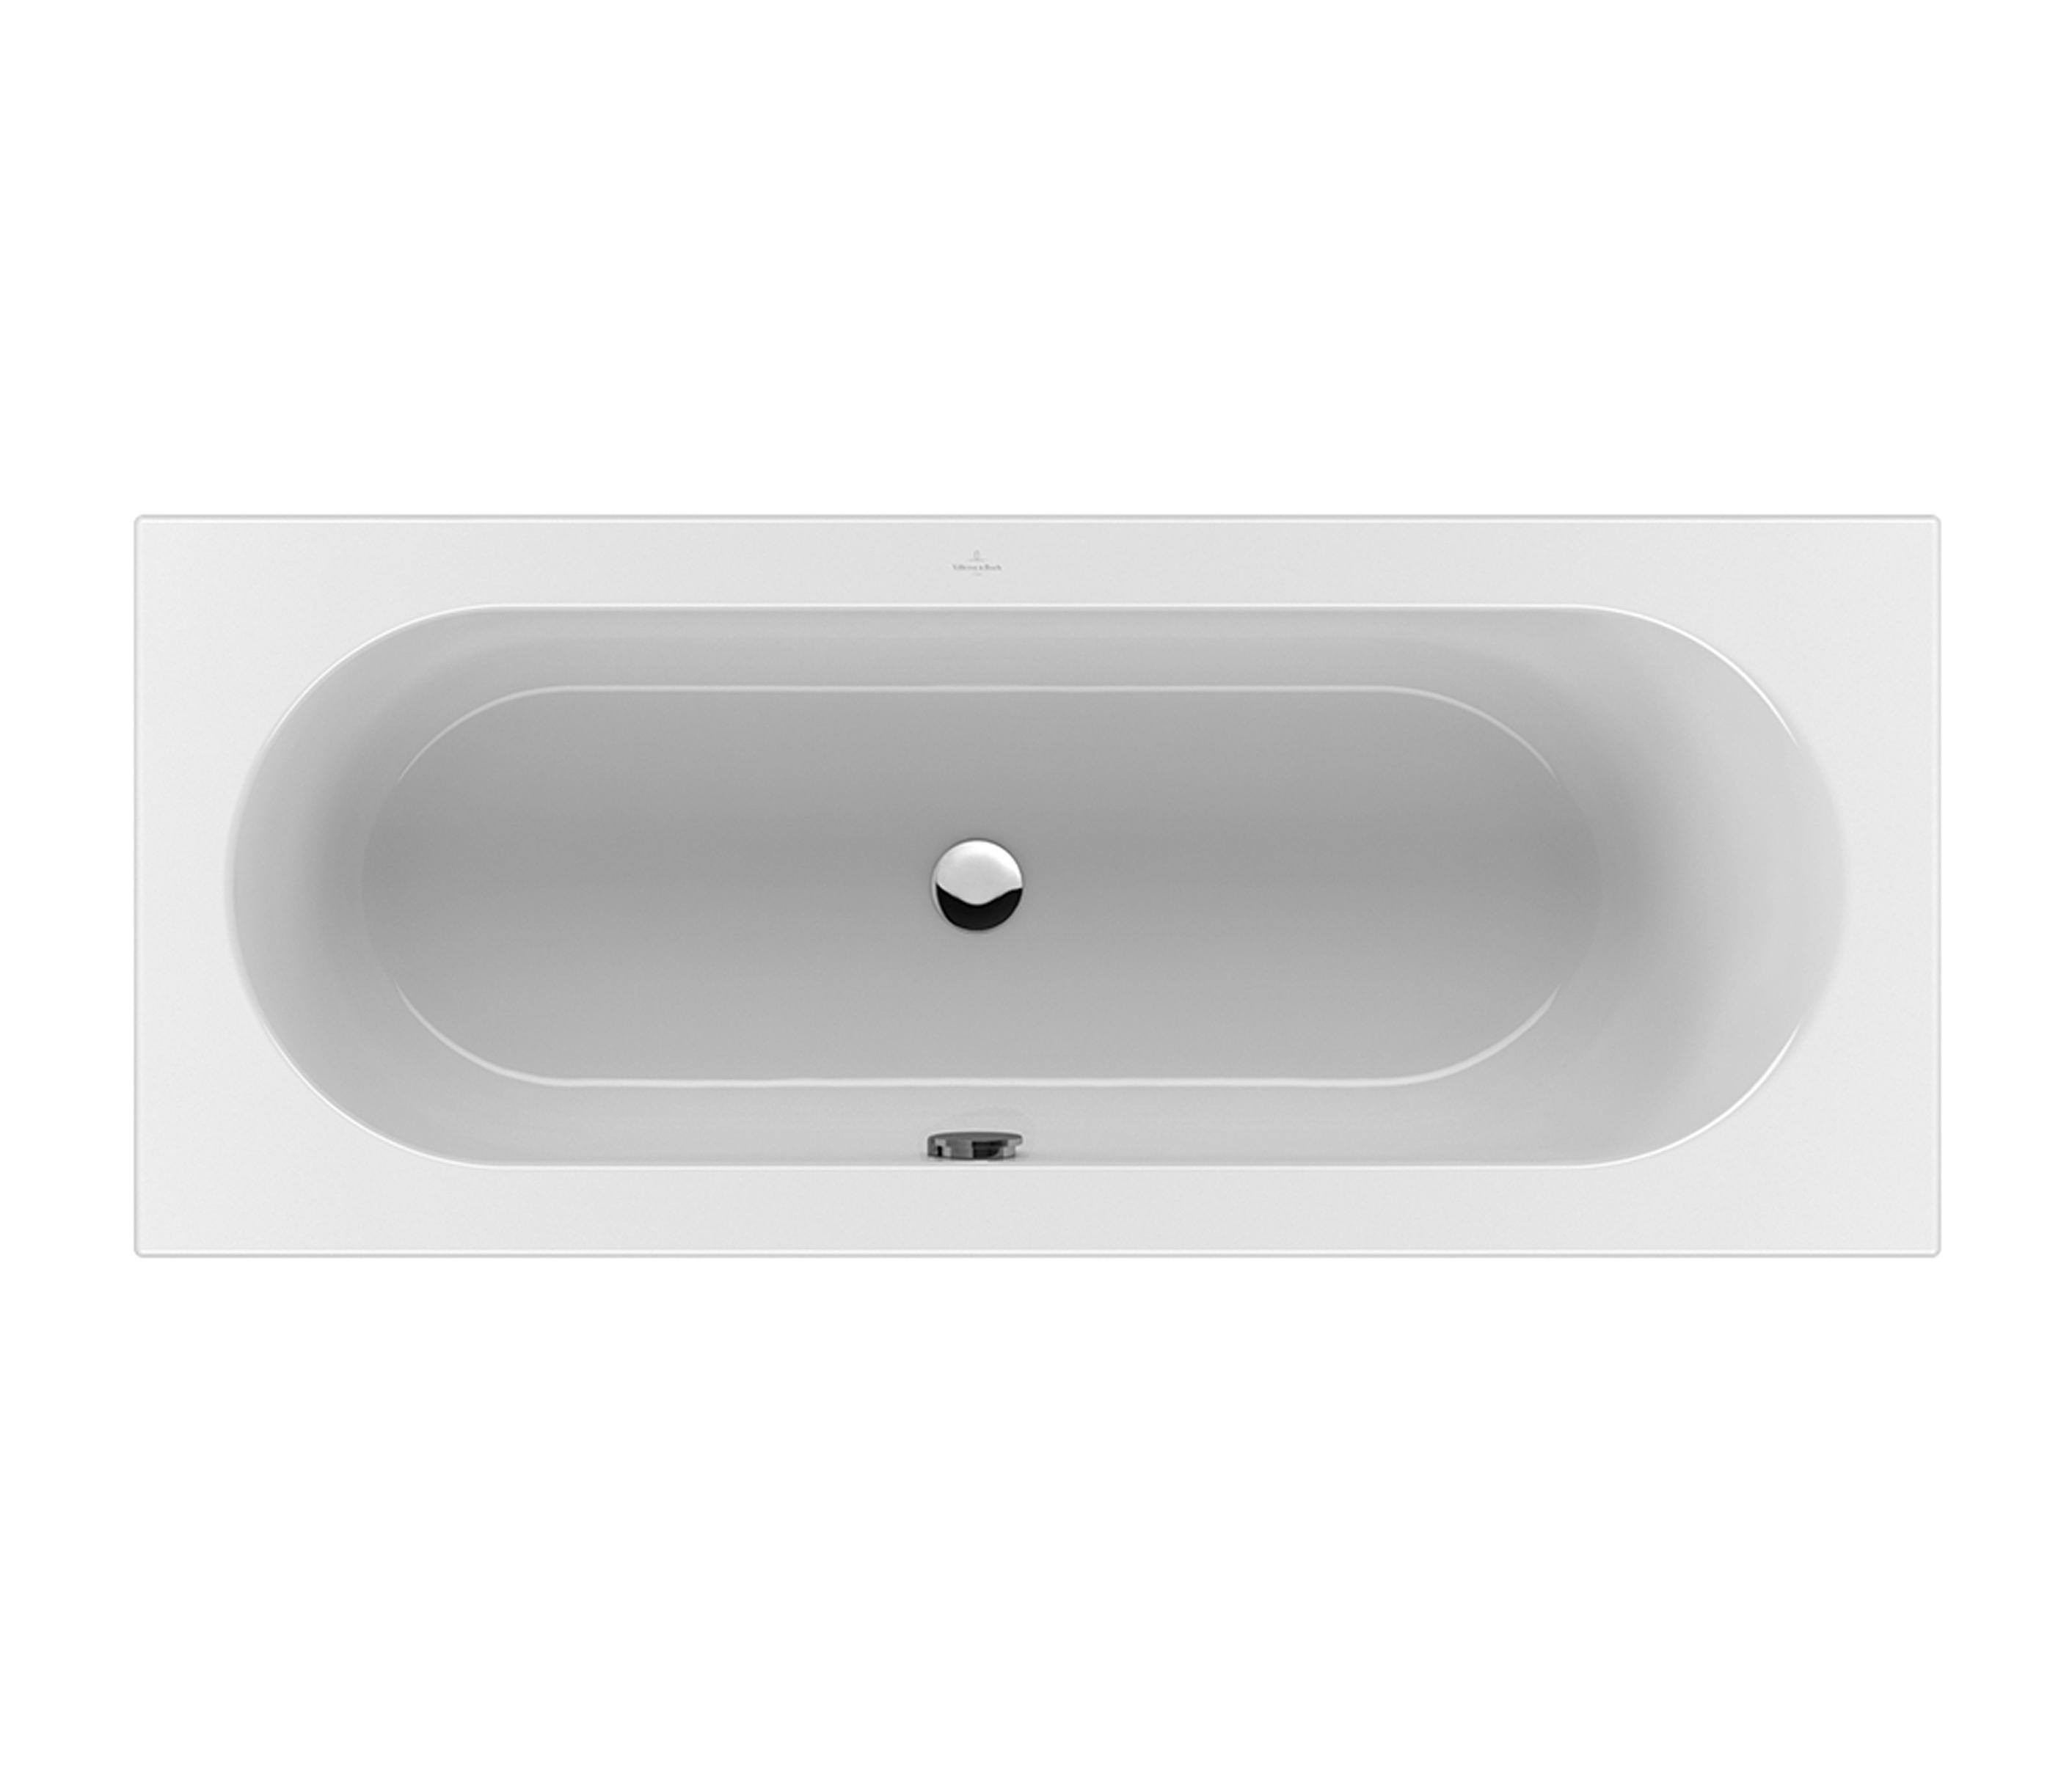 Loop friends vasca da bagno vasche ad incasso villeroy - Vasca da bagno villeroy e boch ...